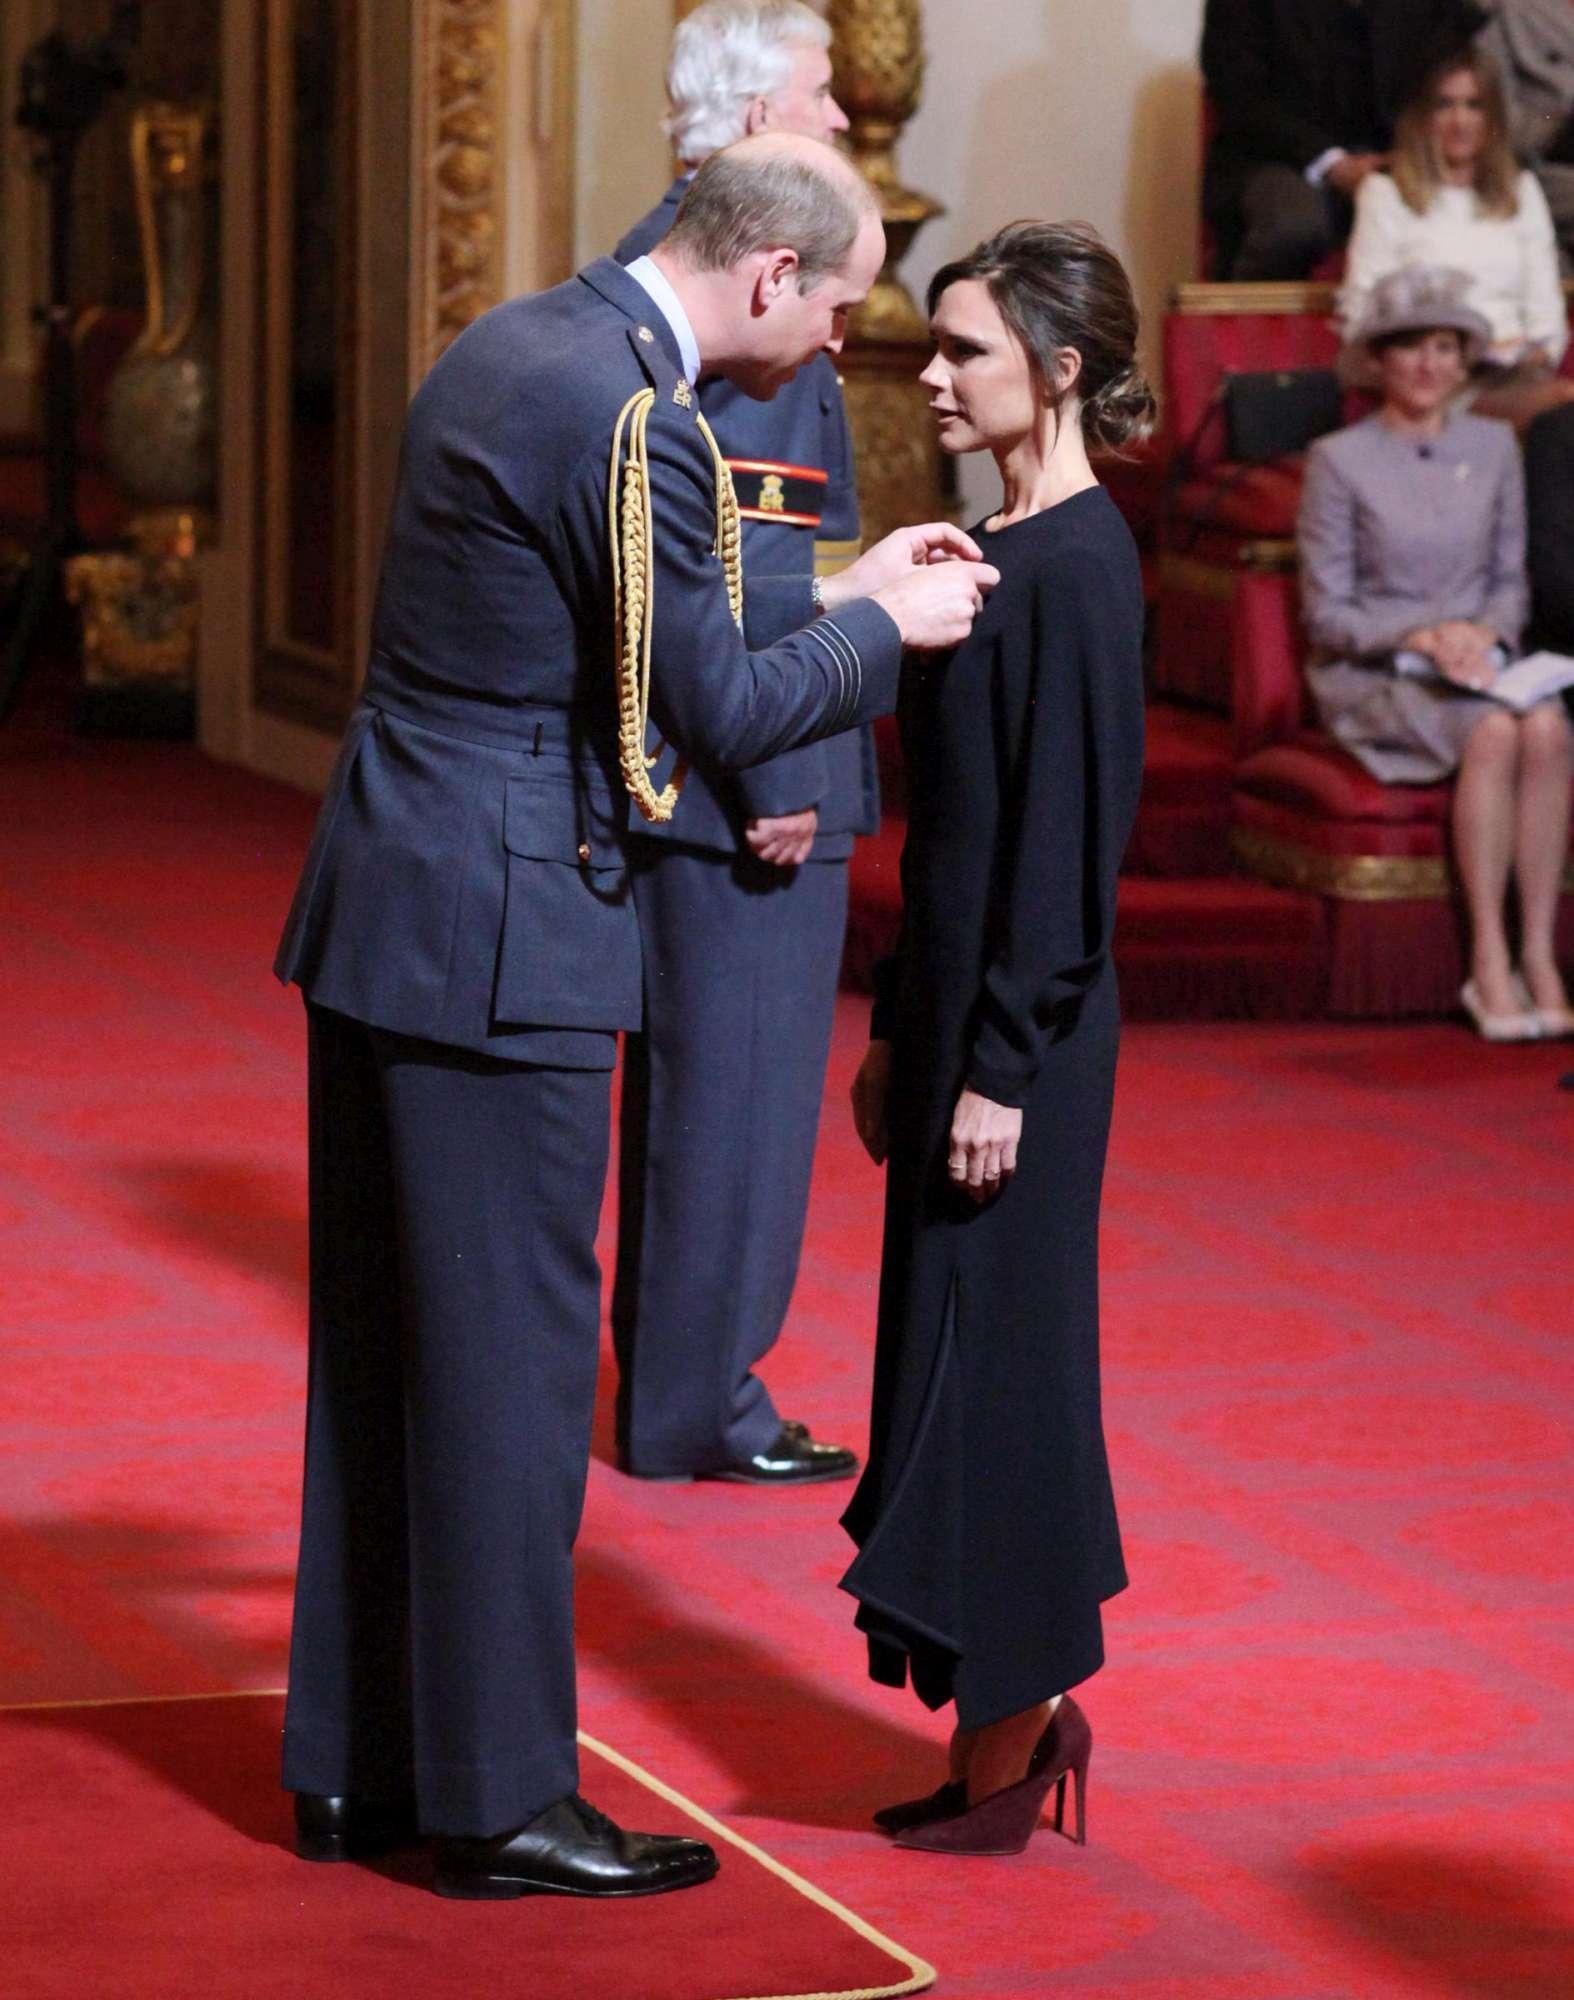 Victoria Beckham a Buckingham Palace per ricevere l Obe